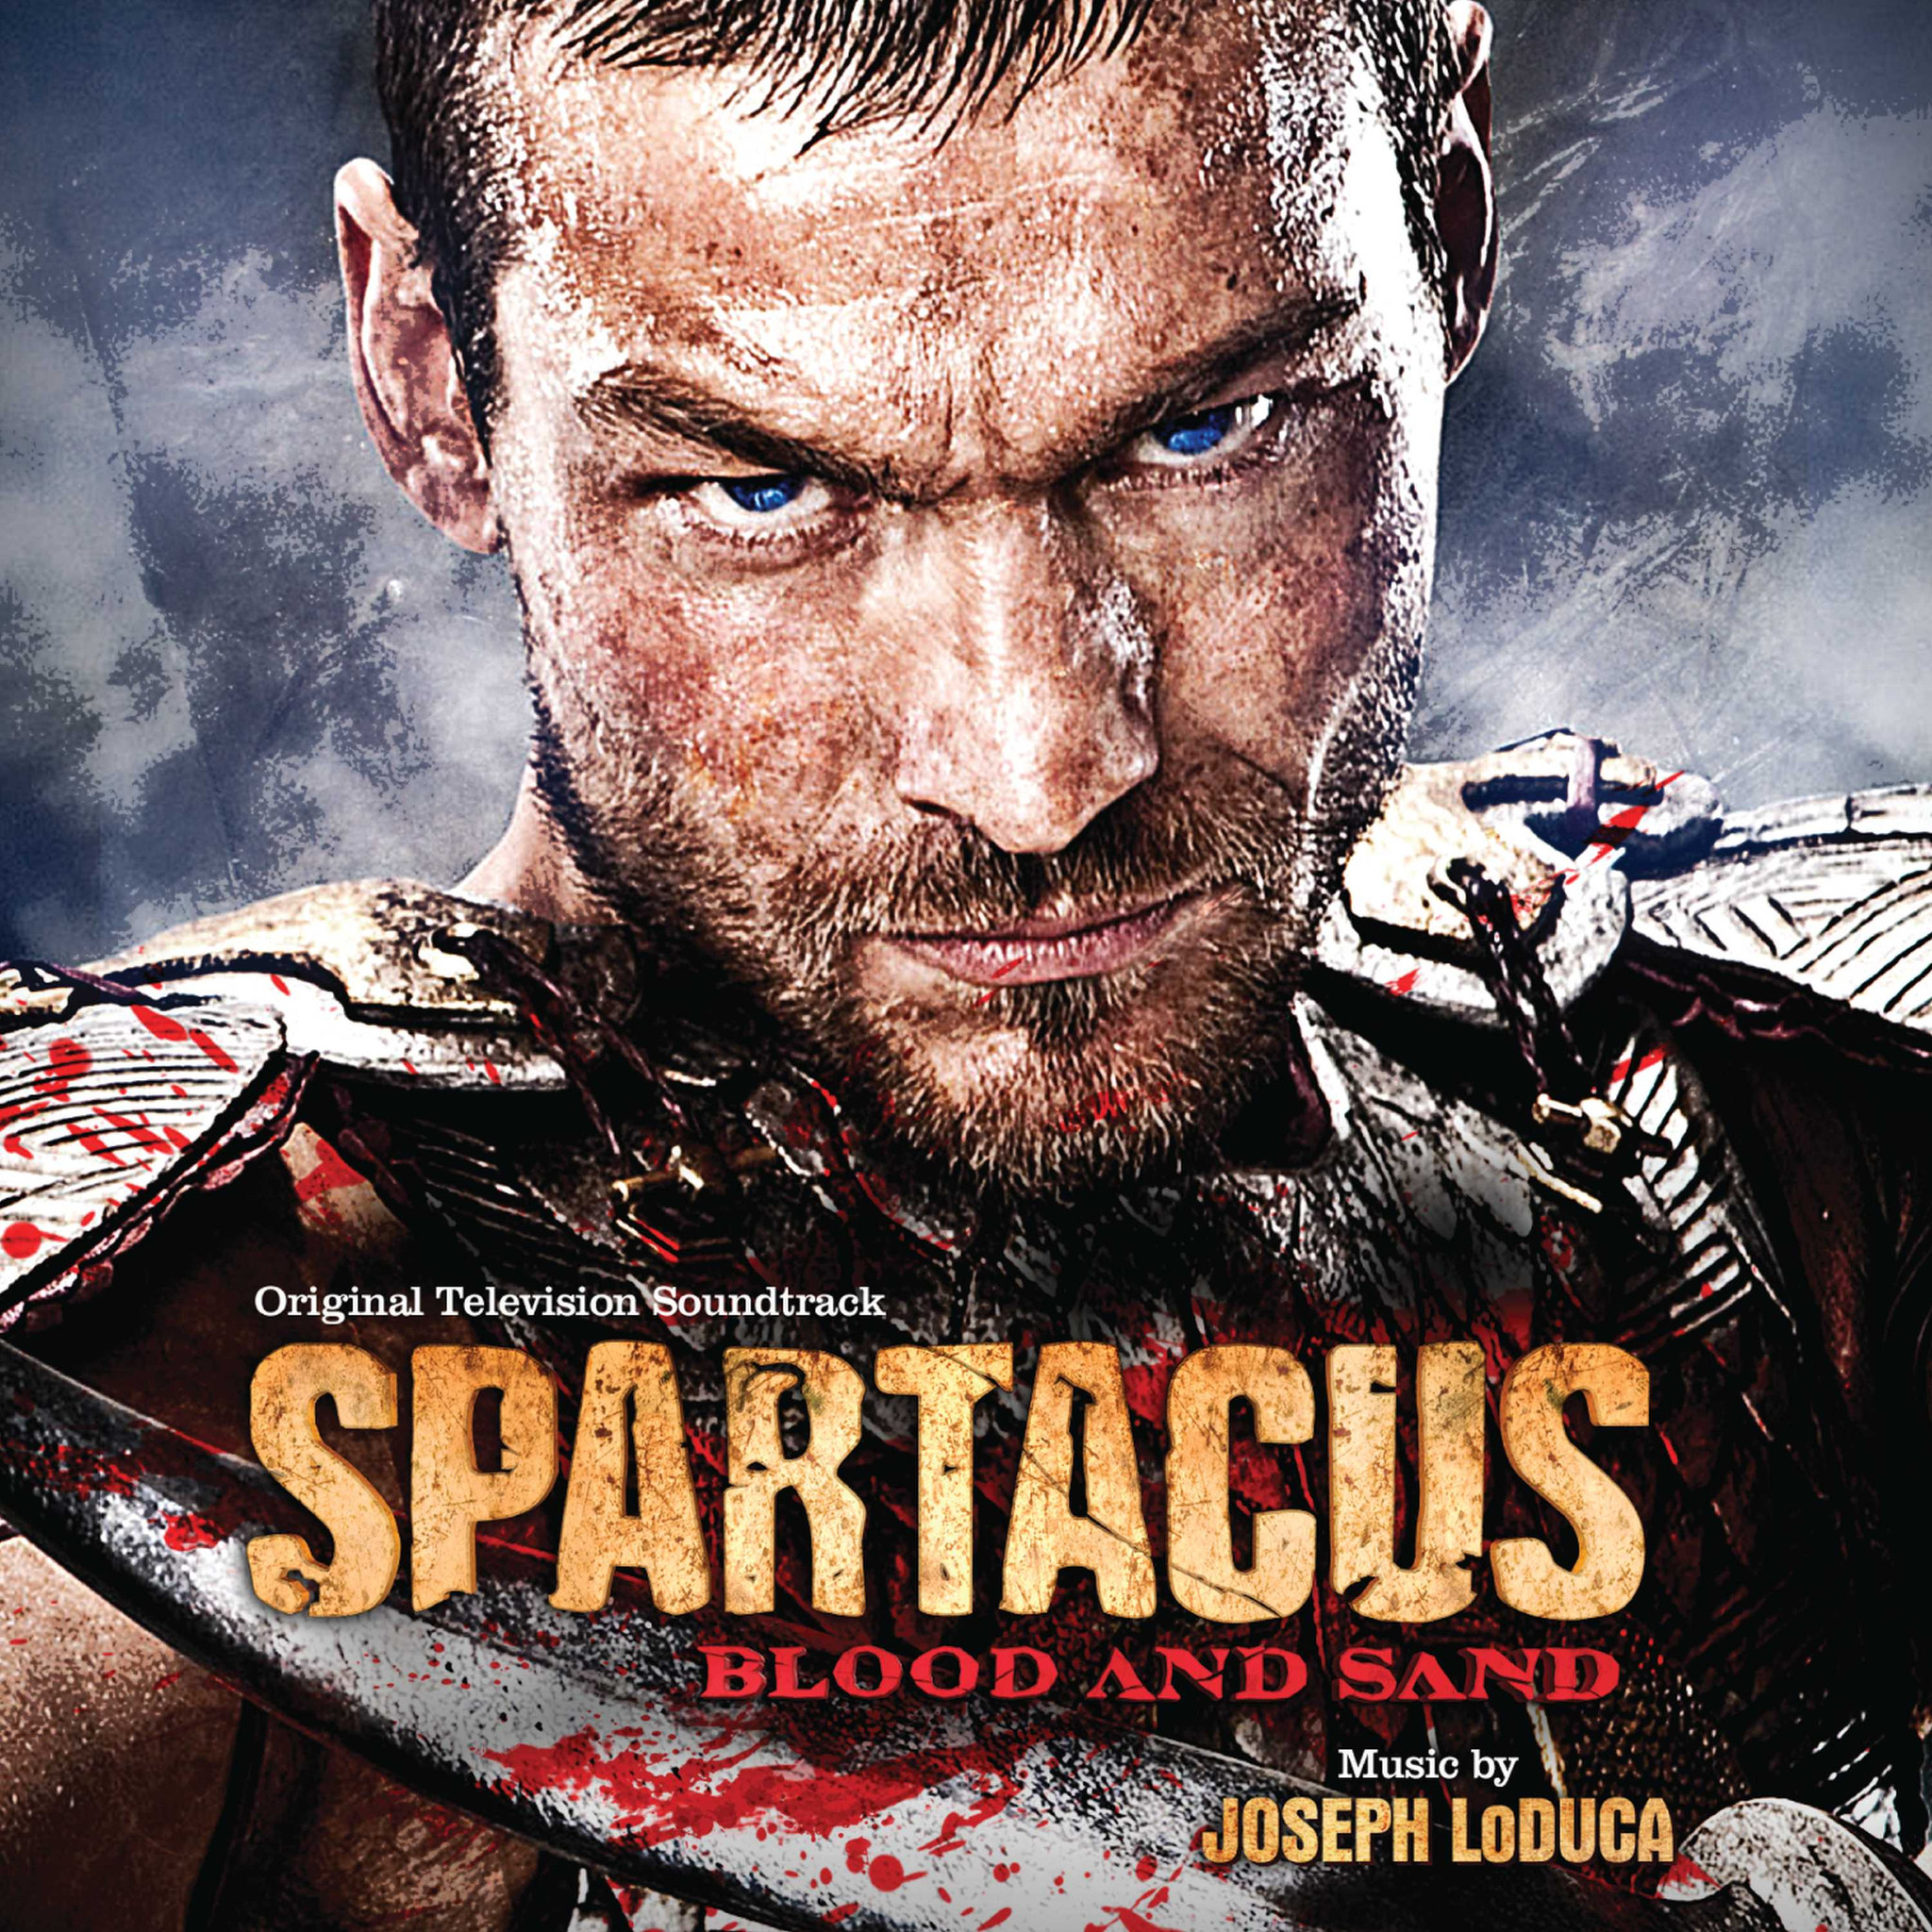 Spartacus: Blood and Sand - O.s.t - Musik - SOUNDTRACK/SCORE - 0030206704525 - November 16, 2019